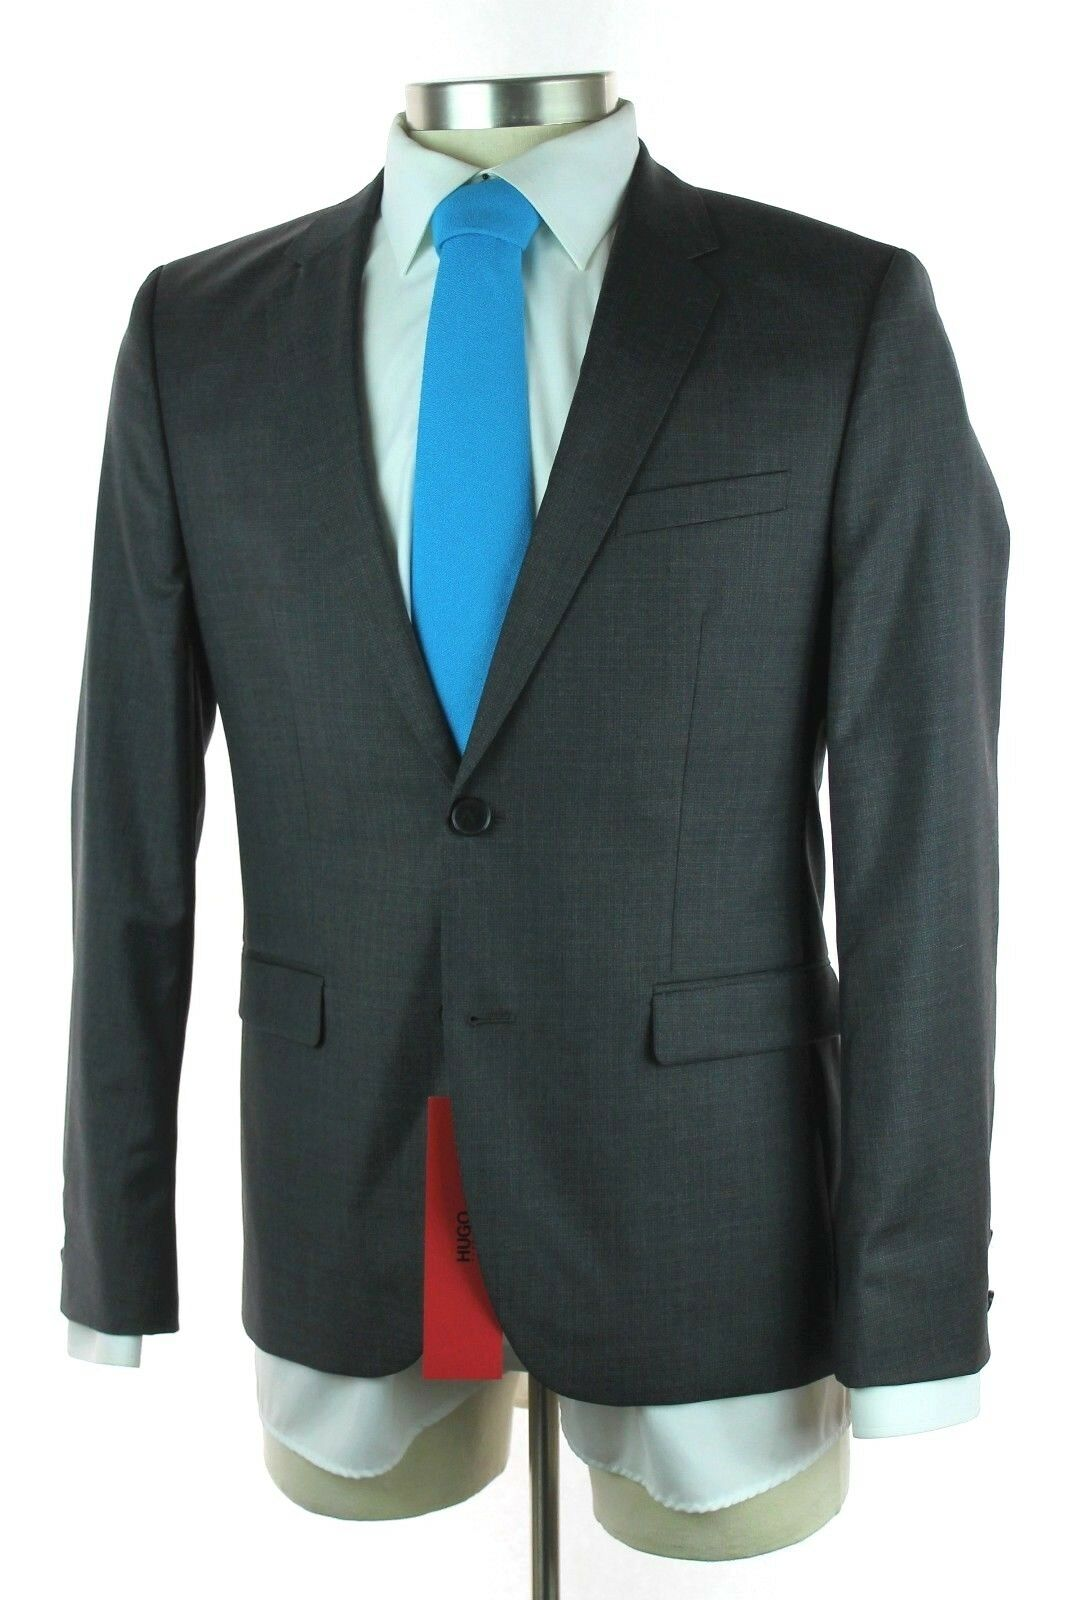 NWT HUGO BOSS ROT LABEL Astain Hets Grau Wool 2Btn Flat Front Suit 50 40 40S